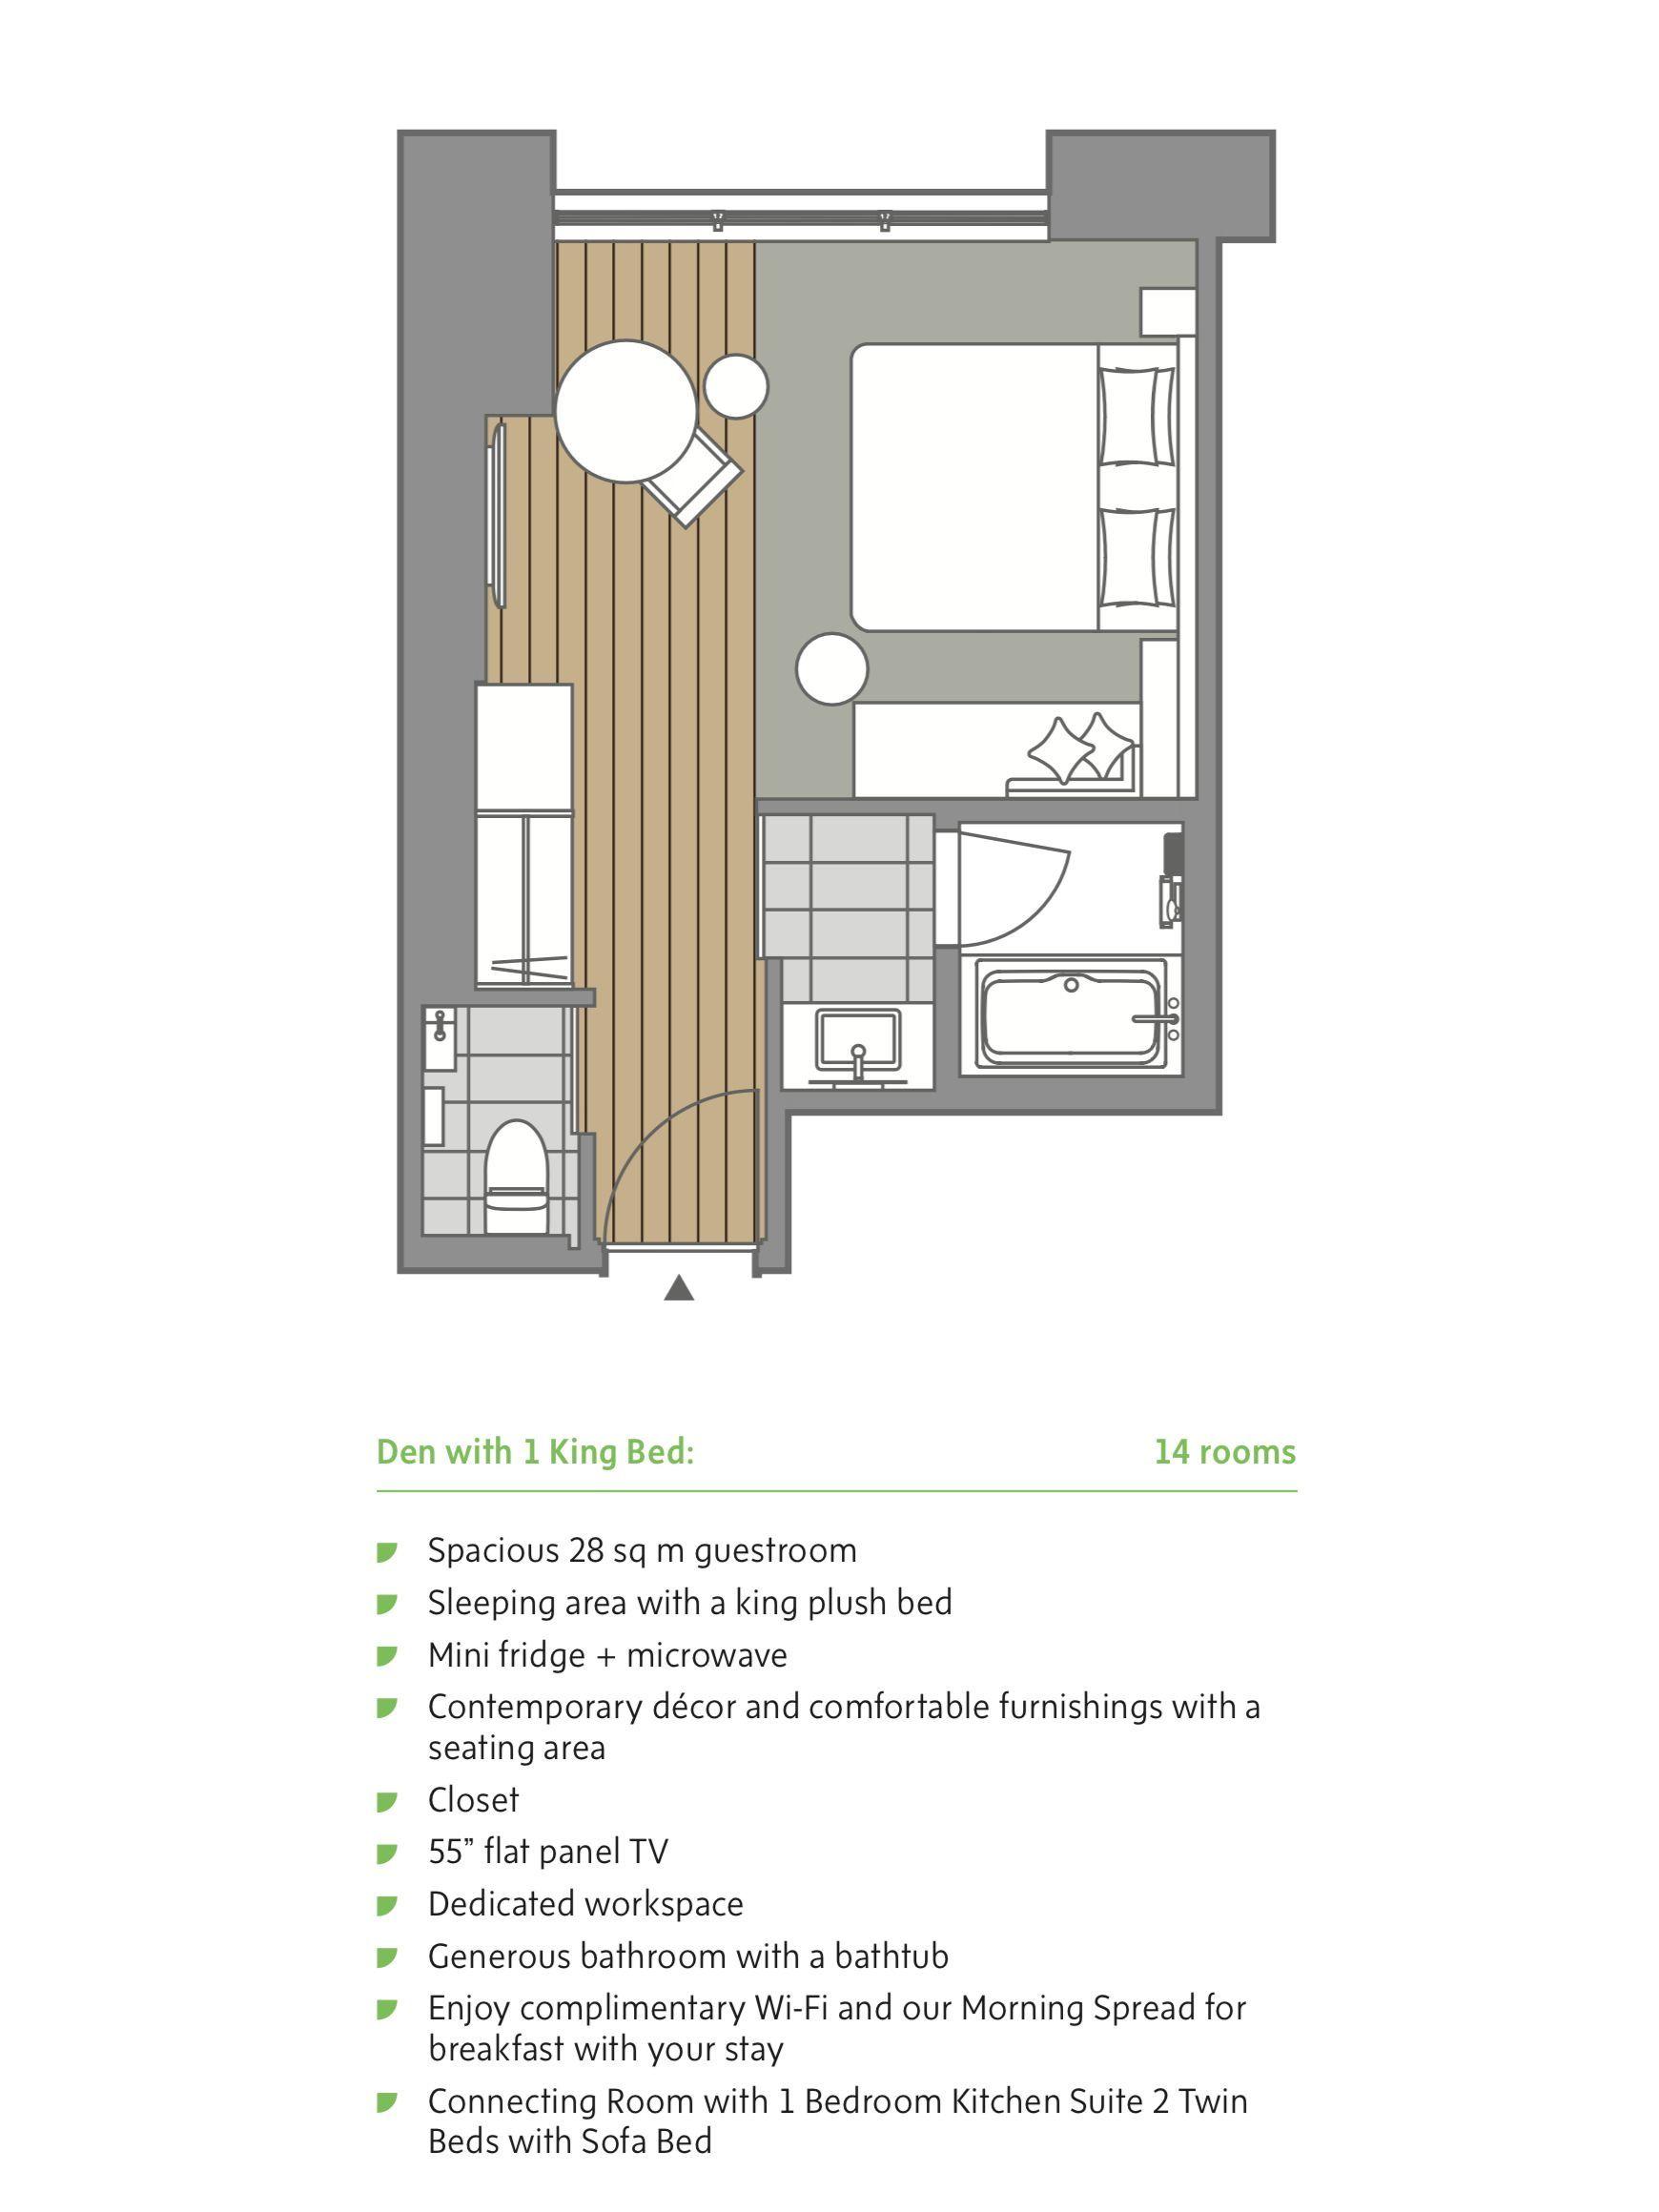 Hyatt House Kanazawa Den With 1 King Bed House Japanese Hotel Floor Plans